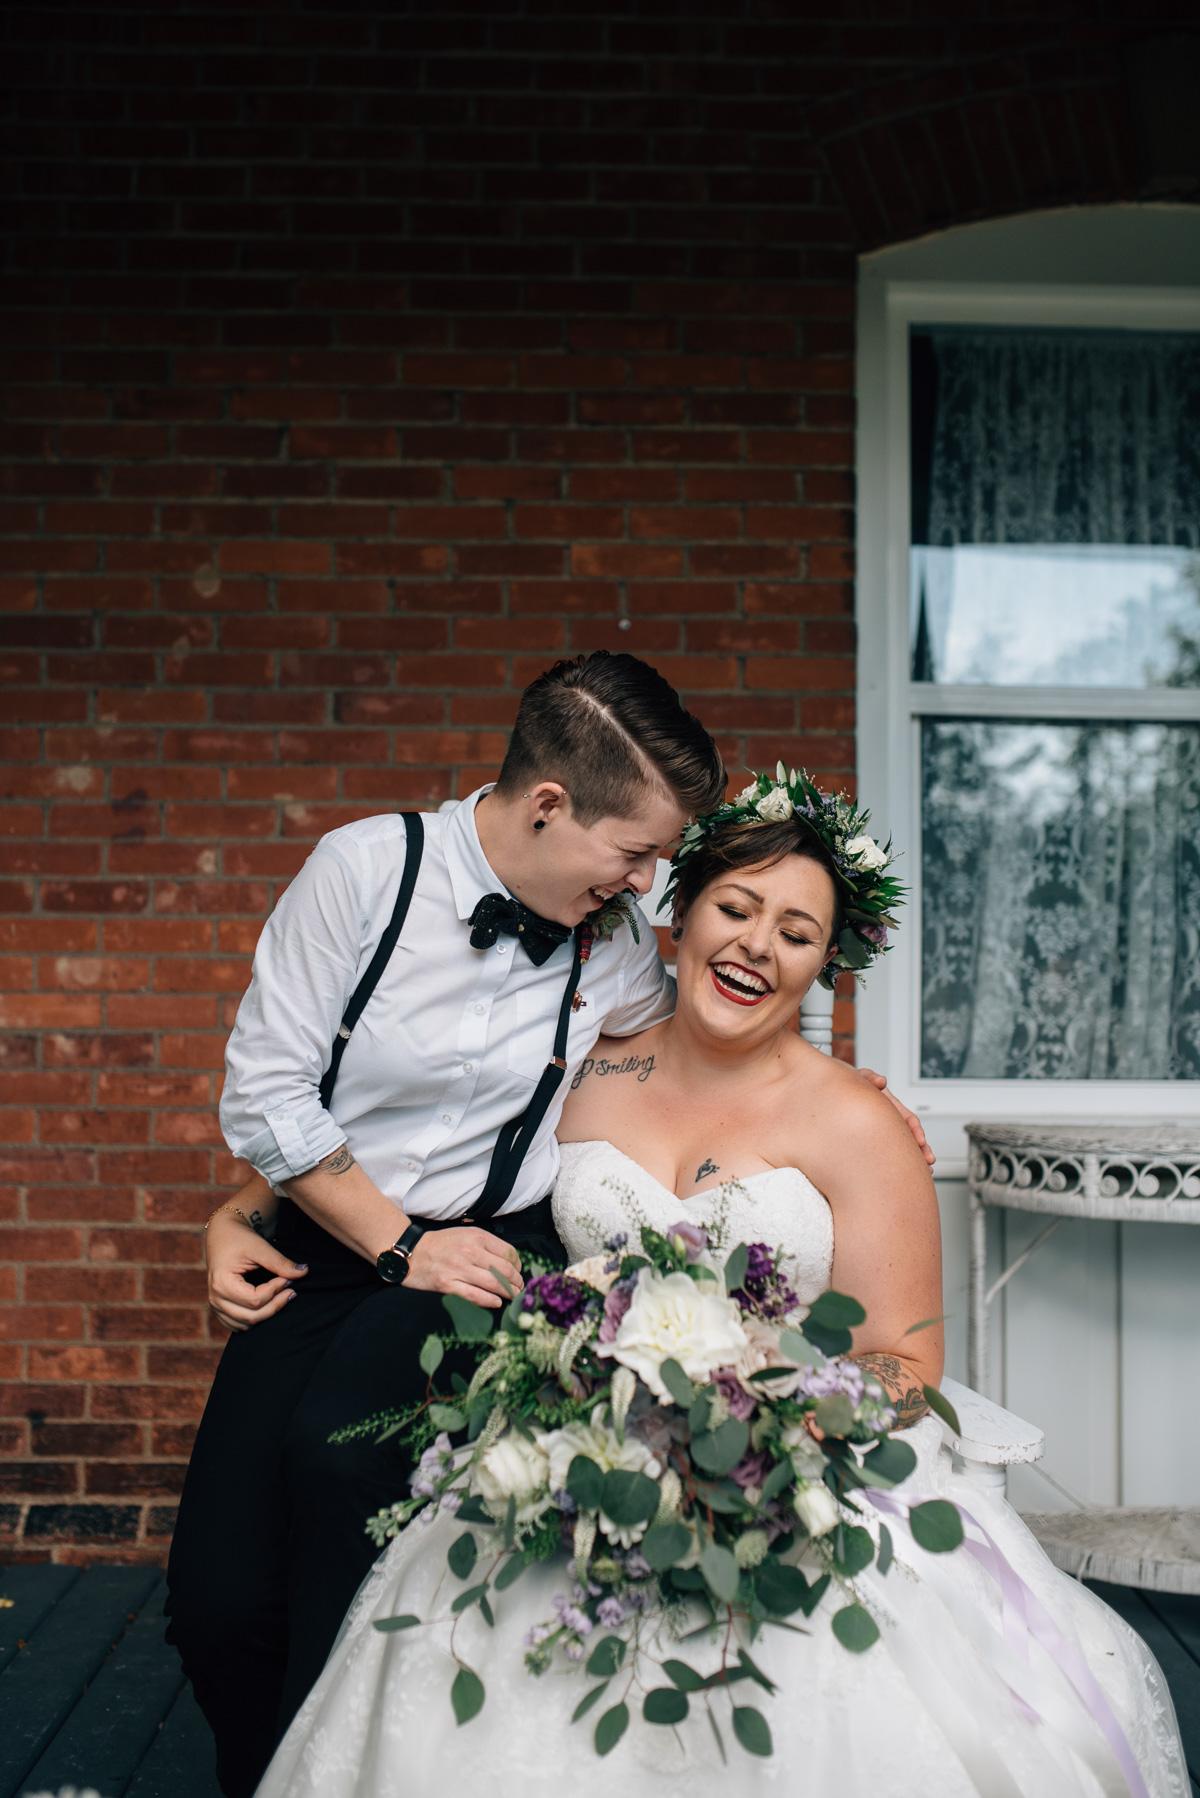 sara-wilde-photography-vineyard-bride-swish-list-beamer-falls-manor-grimsby-wedding-48.jpg